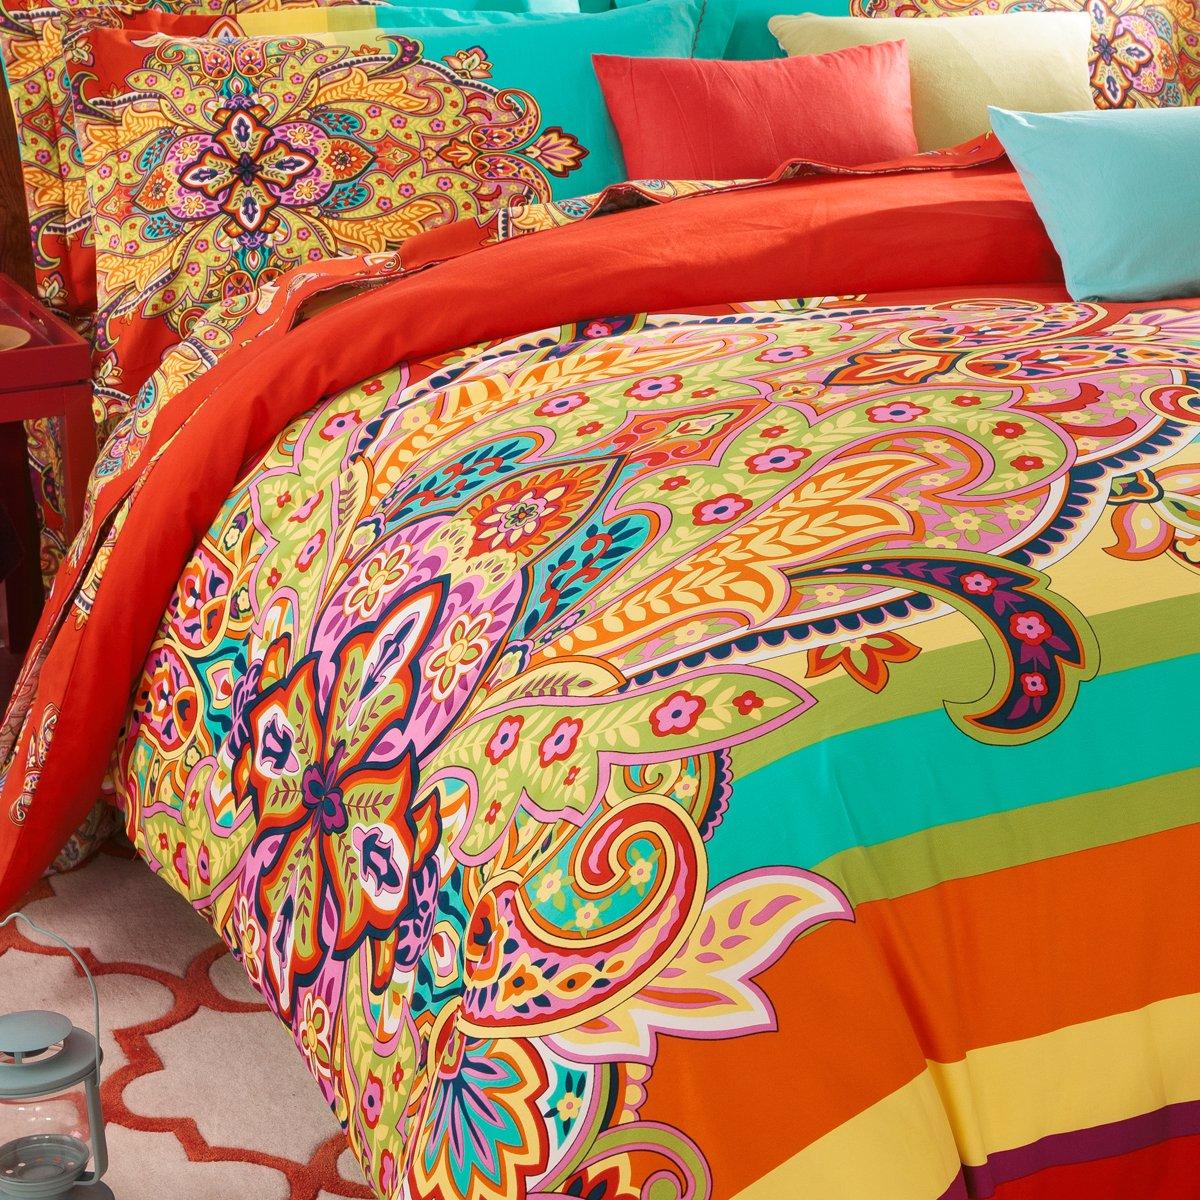 FADFAY Bedding Sets